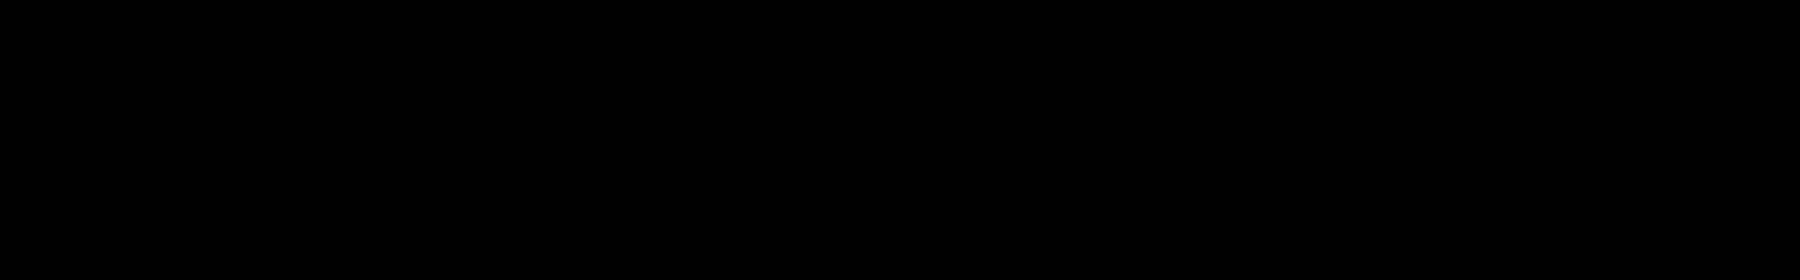 Kunundrum Triple Bundle audio waveform